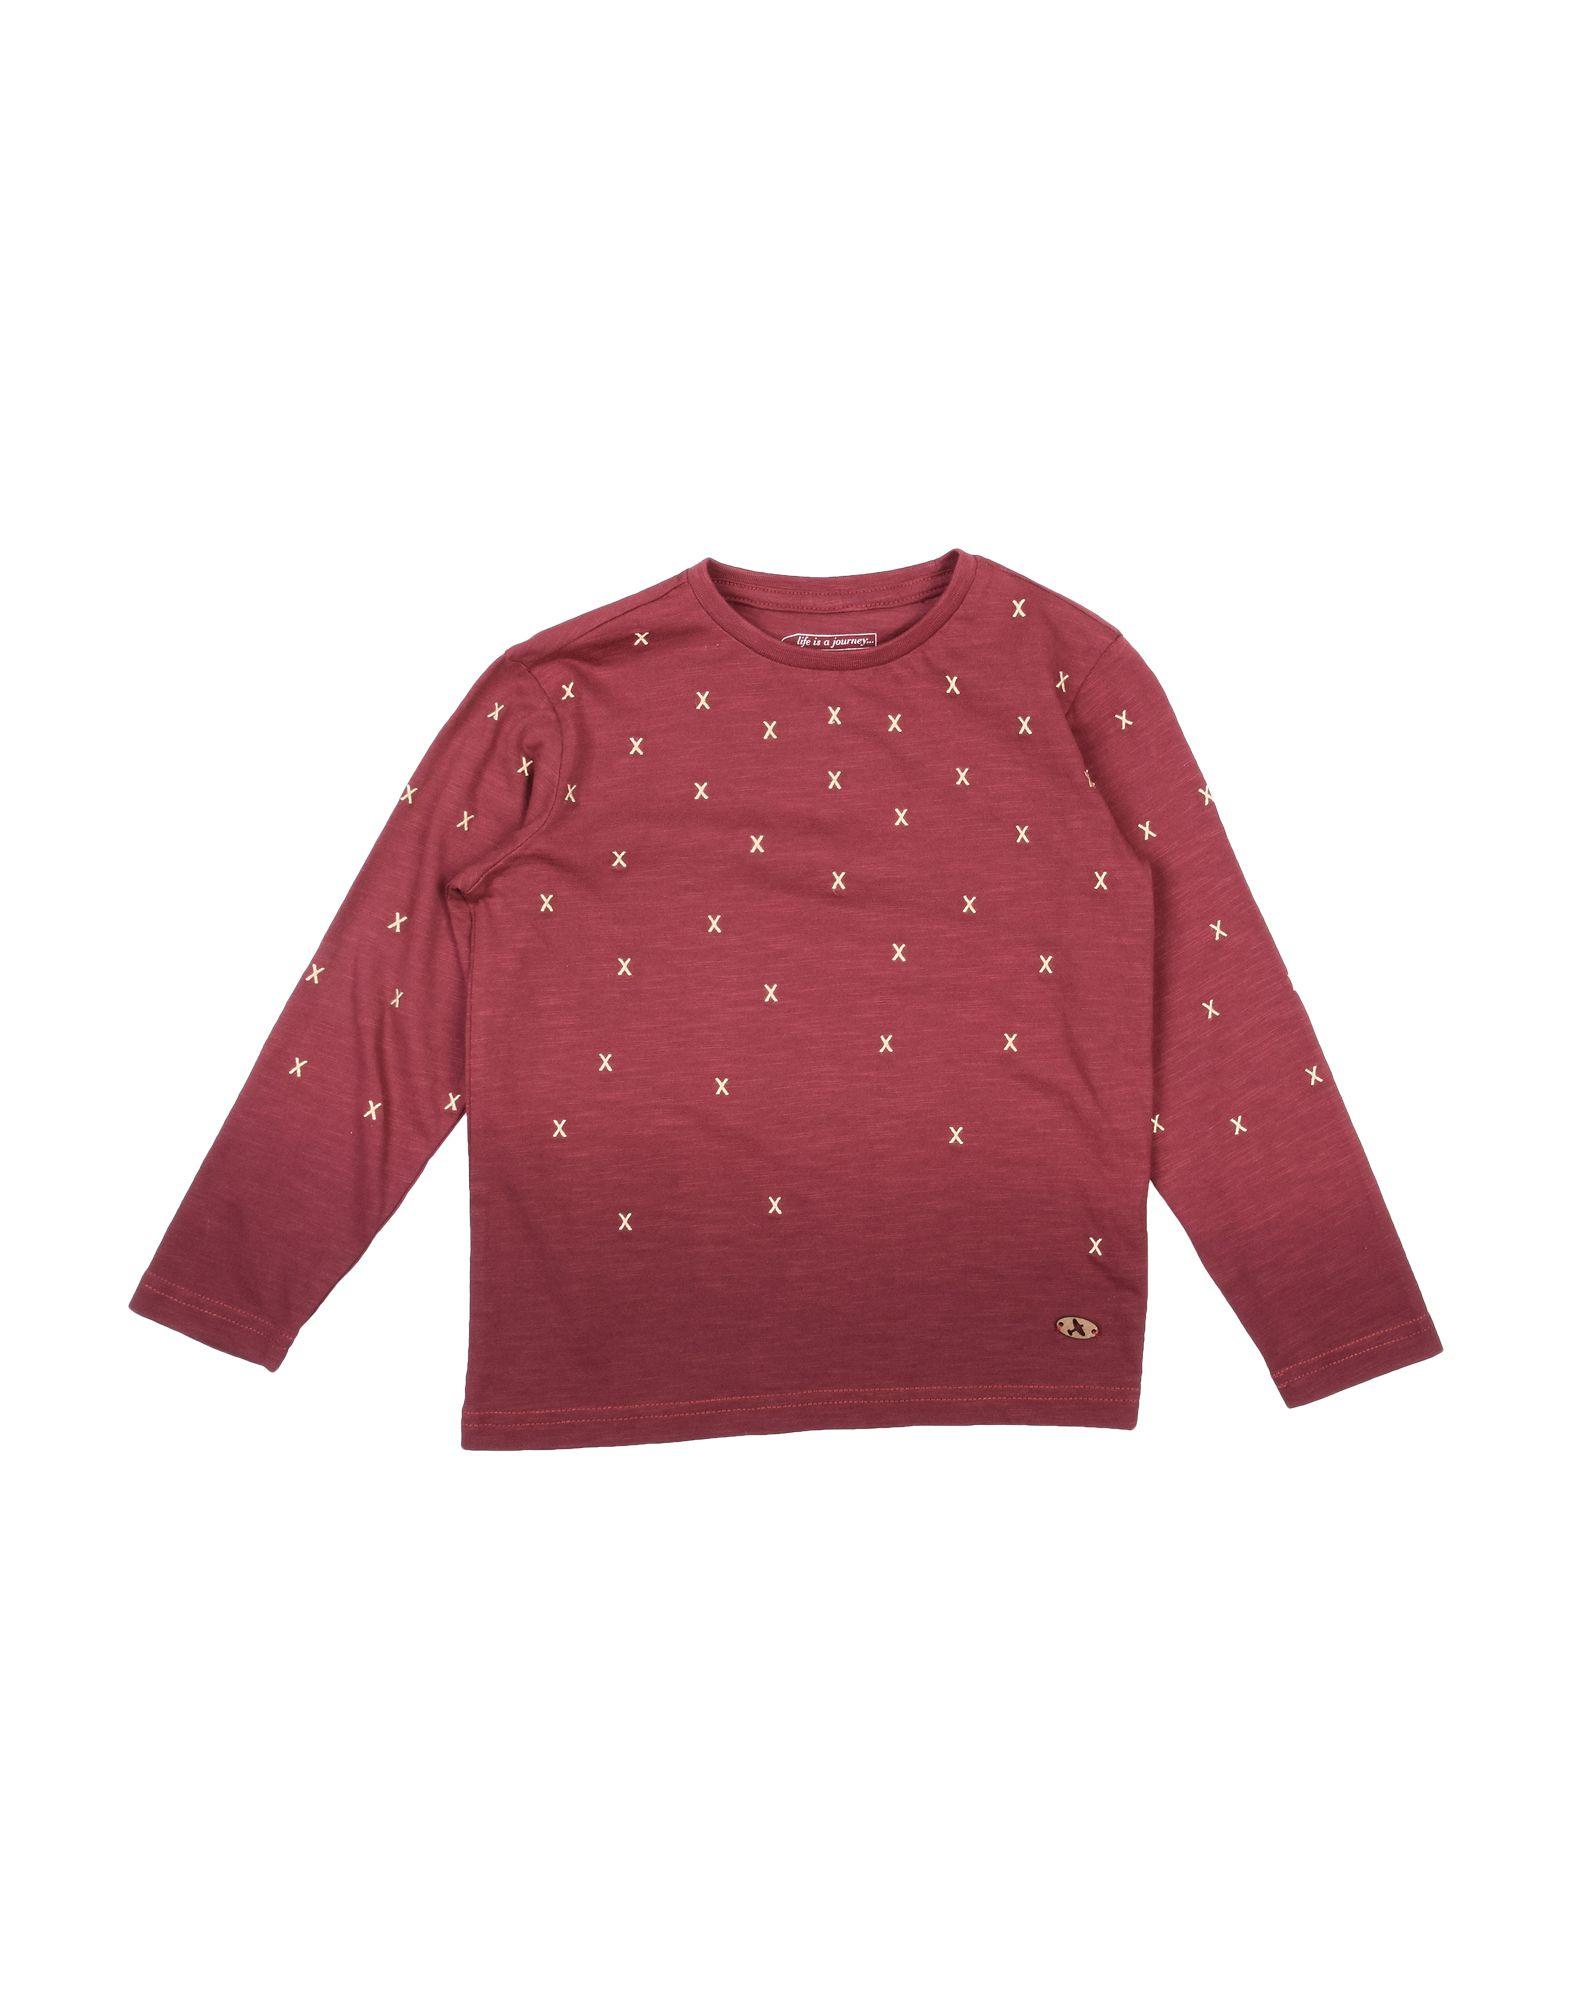 Sp1 Kids' T-shirts In Burgundy